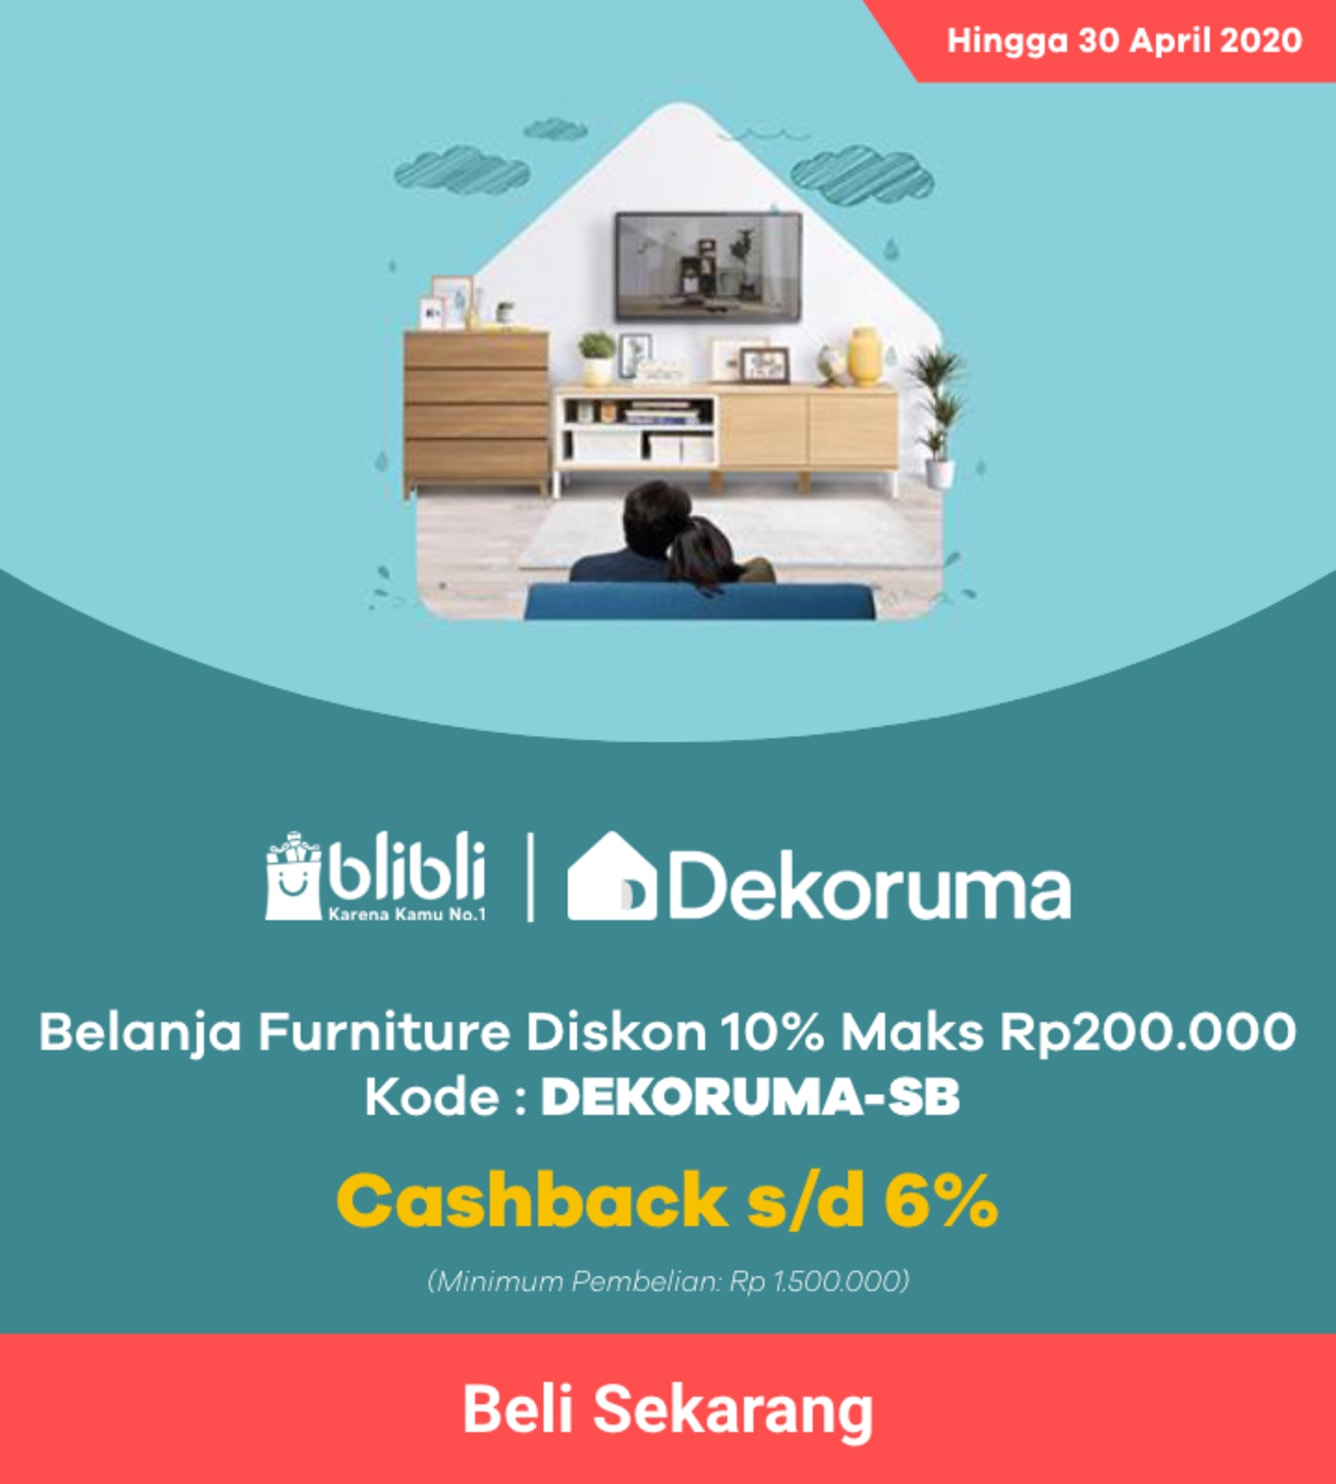 Week 14 - Promo Blibli Dekoruma